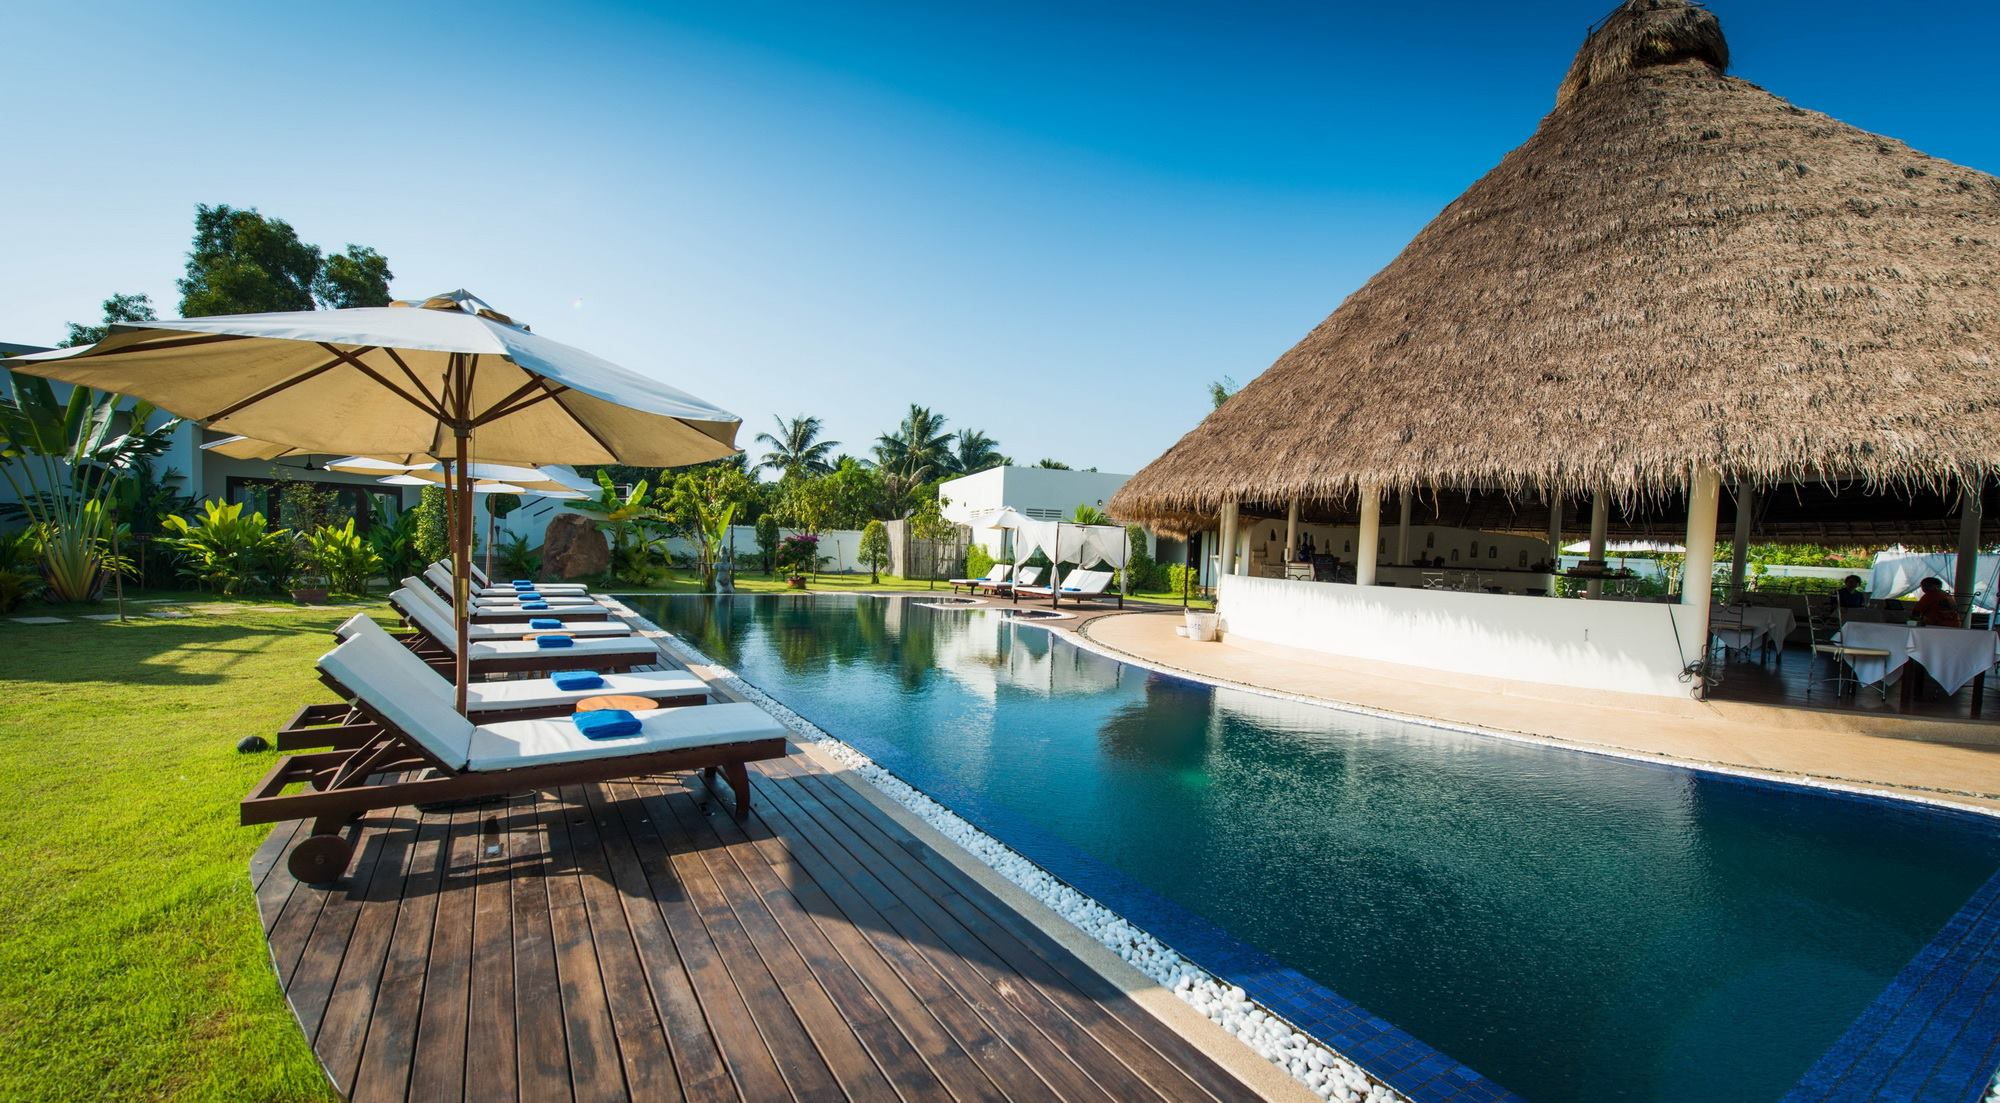 navutu-dreams-resort-and-wellness-retreat-center-krong-siem-reap-cambodia-6